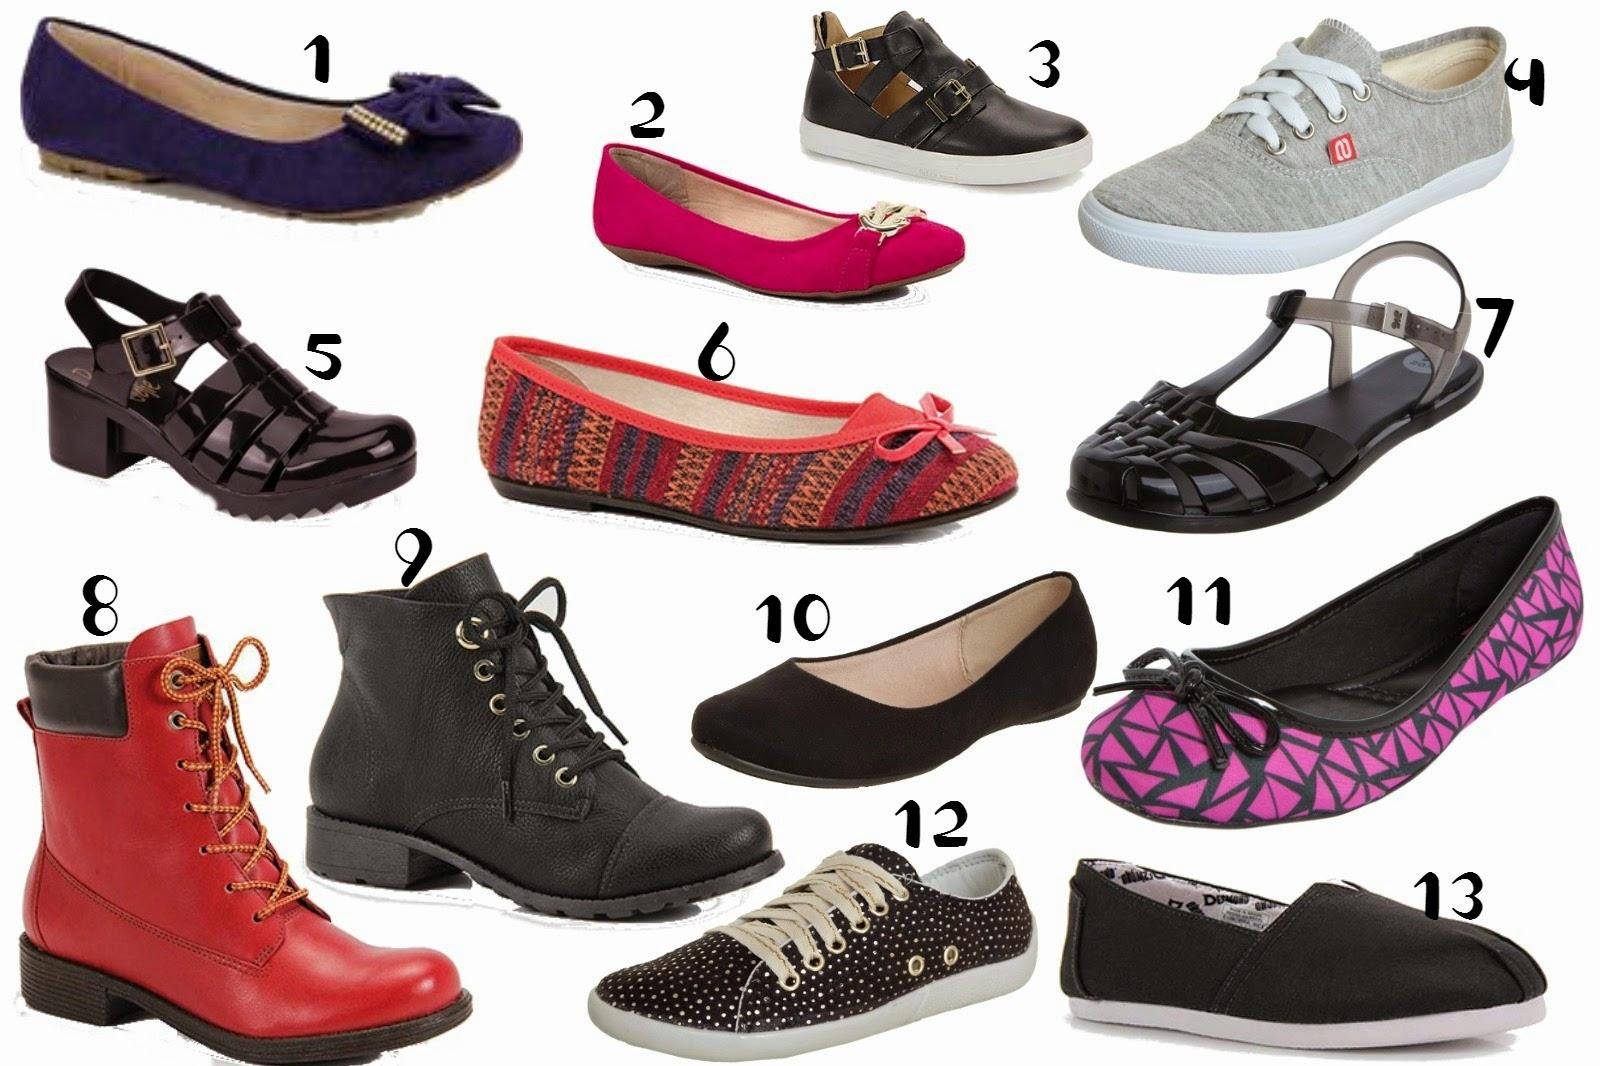 Wishlist Sapatos Dafiti Moleca Petite Jolie